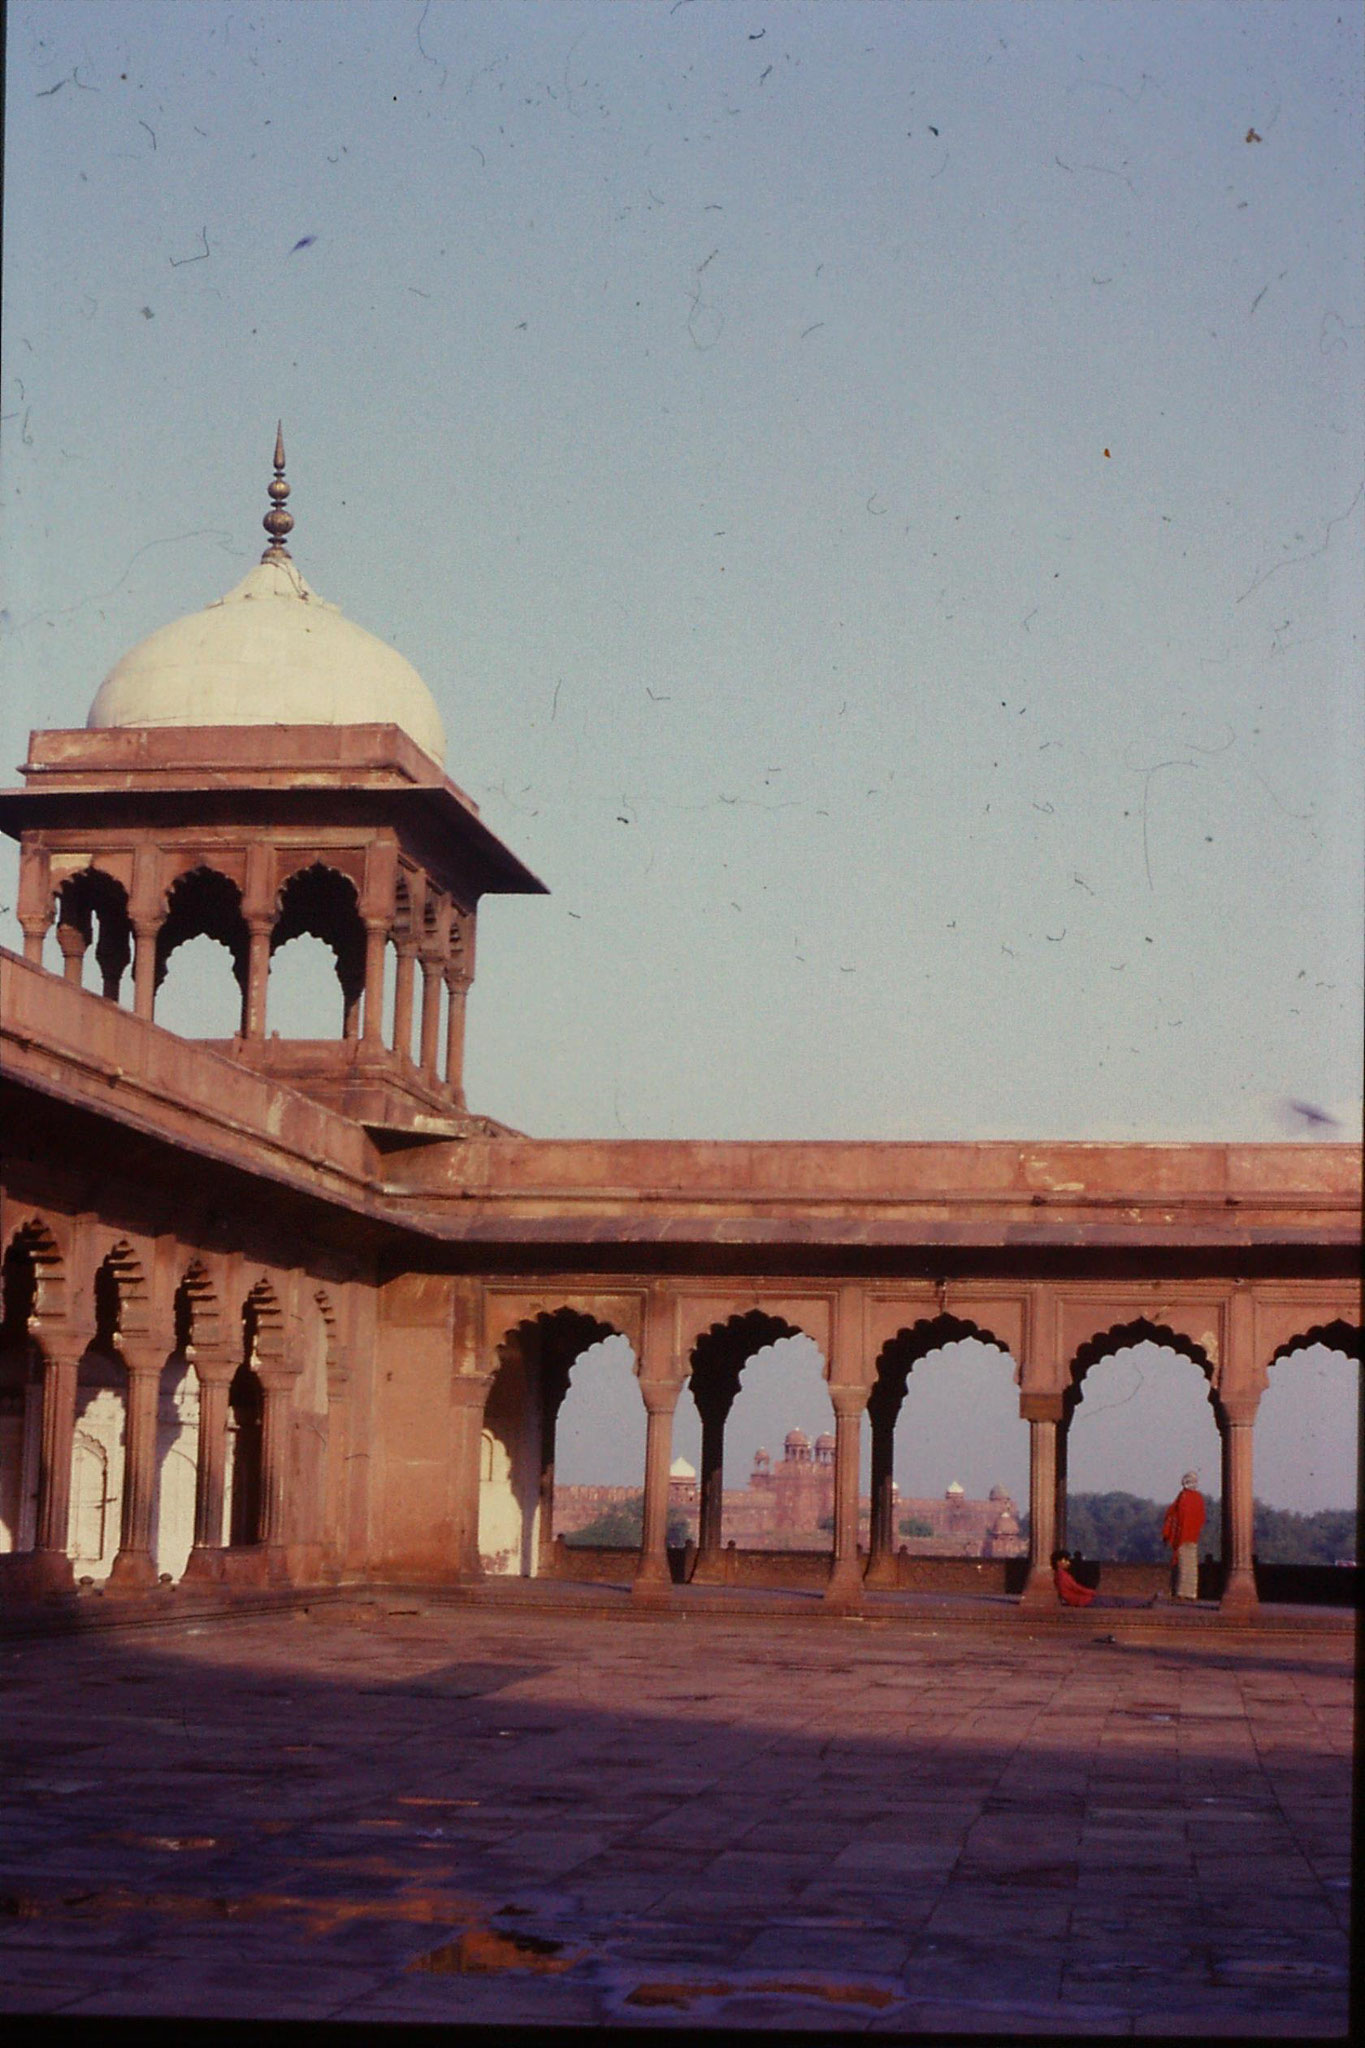 24/11/1989: 24: Delhi Red Fort & Jami Masjid